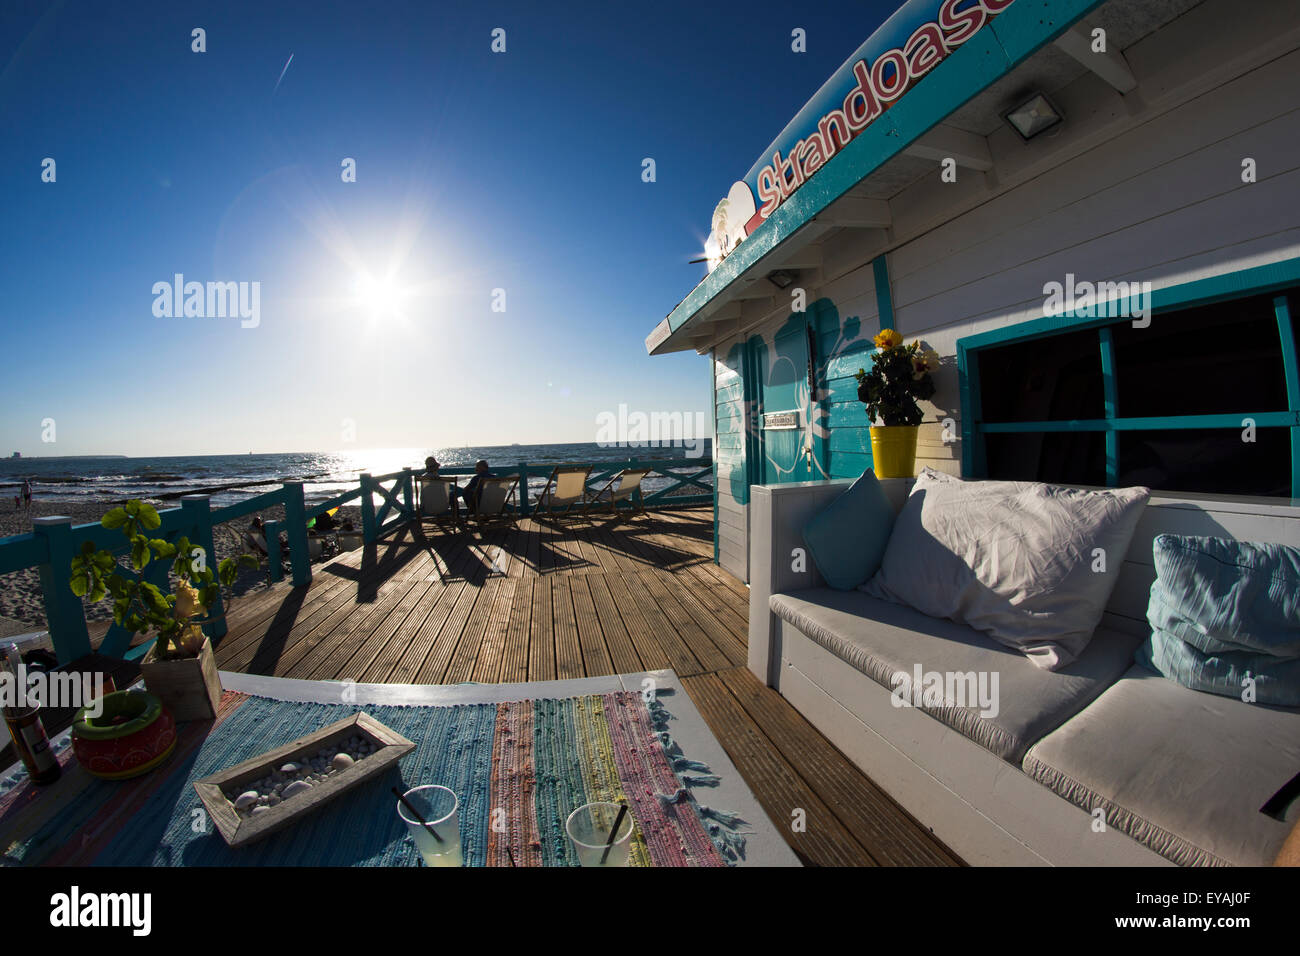 Strandoase Beachbar at Baltic Sea in Germany, Mecklenburg - Vorpommern. - Stock Image